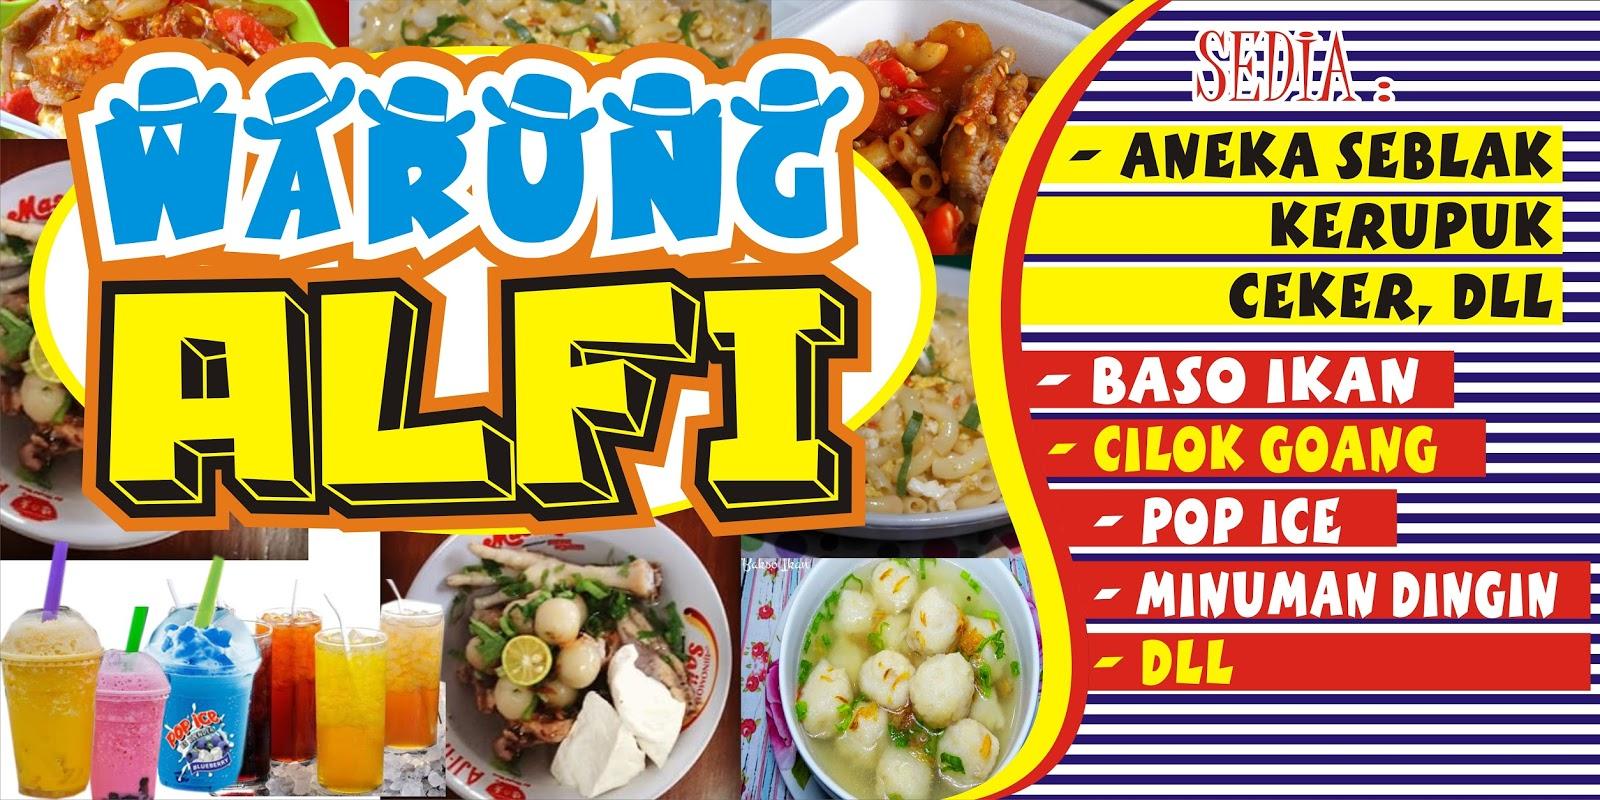 Download Contoh Spanduk Aneka Makanan Cdr Karyaku